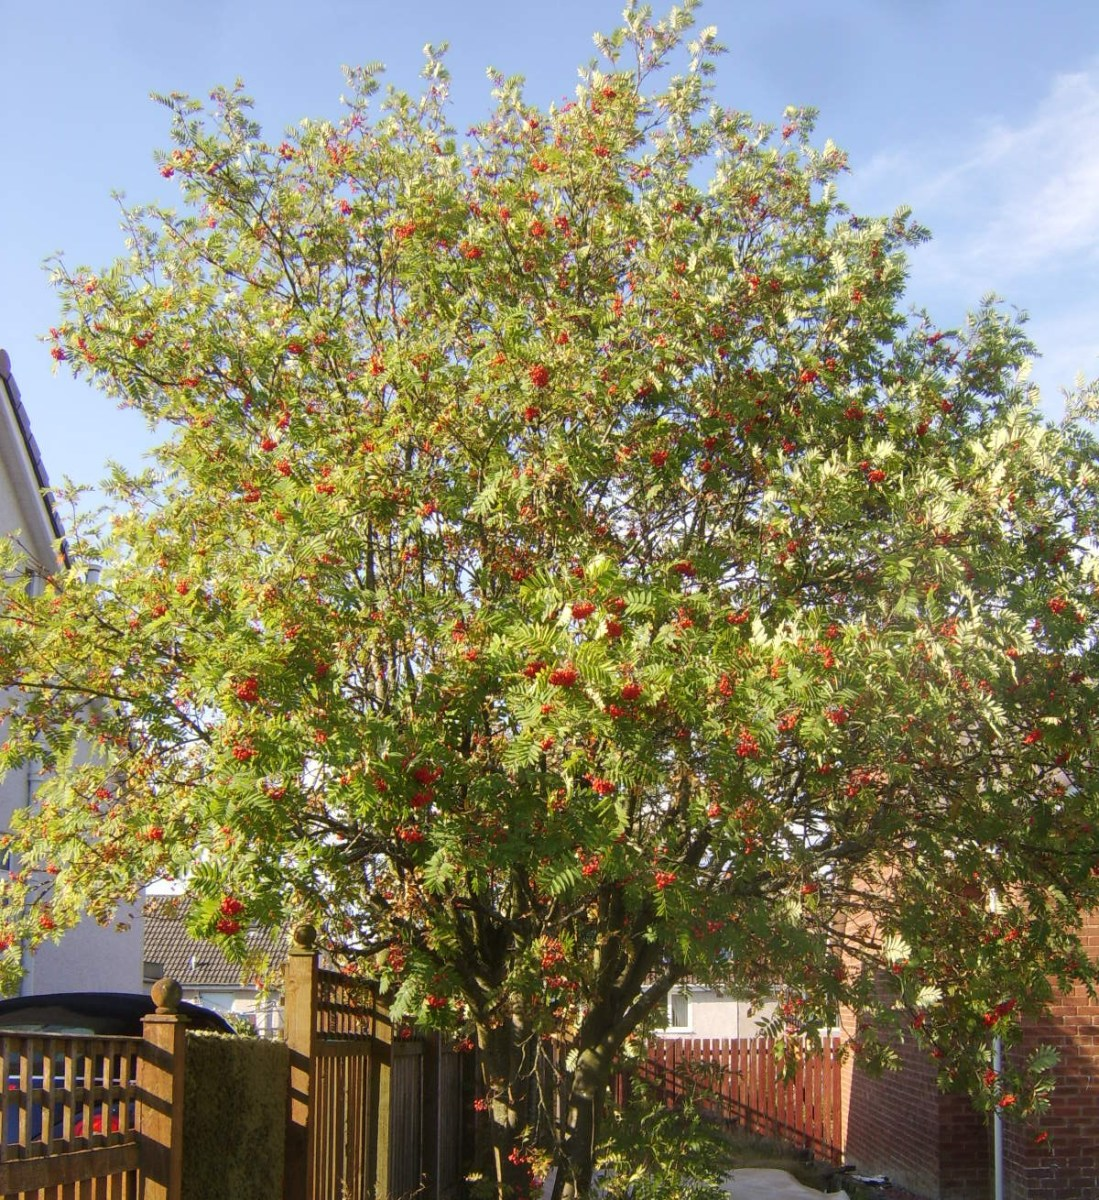 Rowan tree laden with berries in late summer